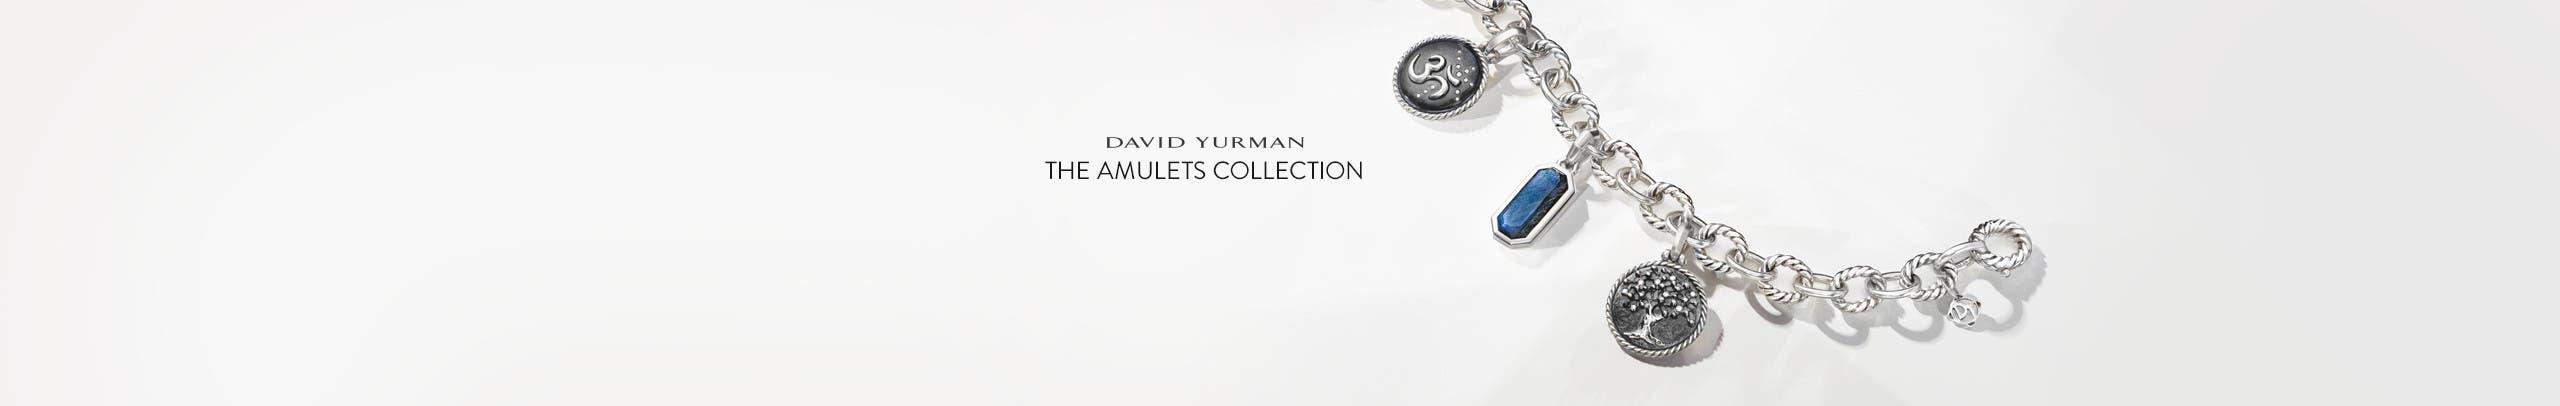 David Yurman: The Amulets Collection.